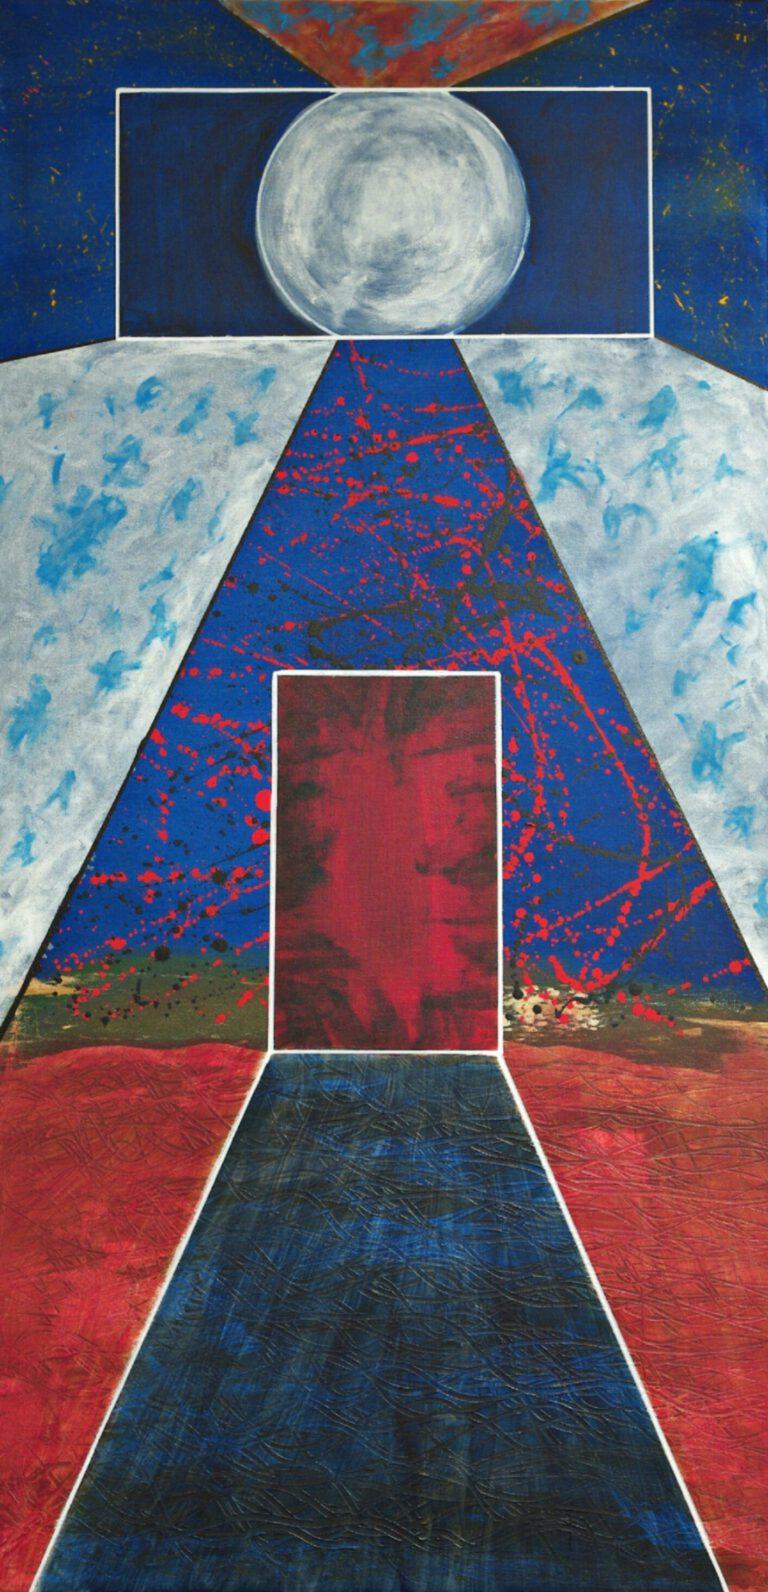 Abstrakte Kunst - Tom Helman - 200530-corona-nights